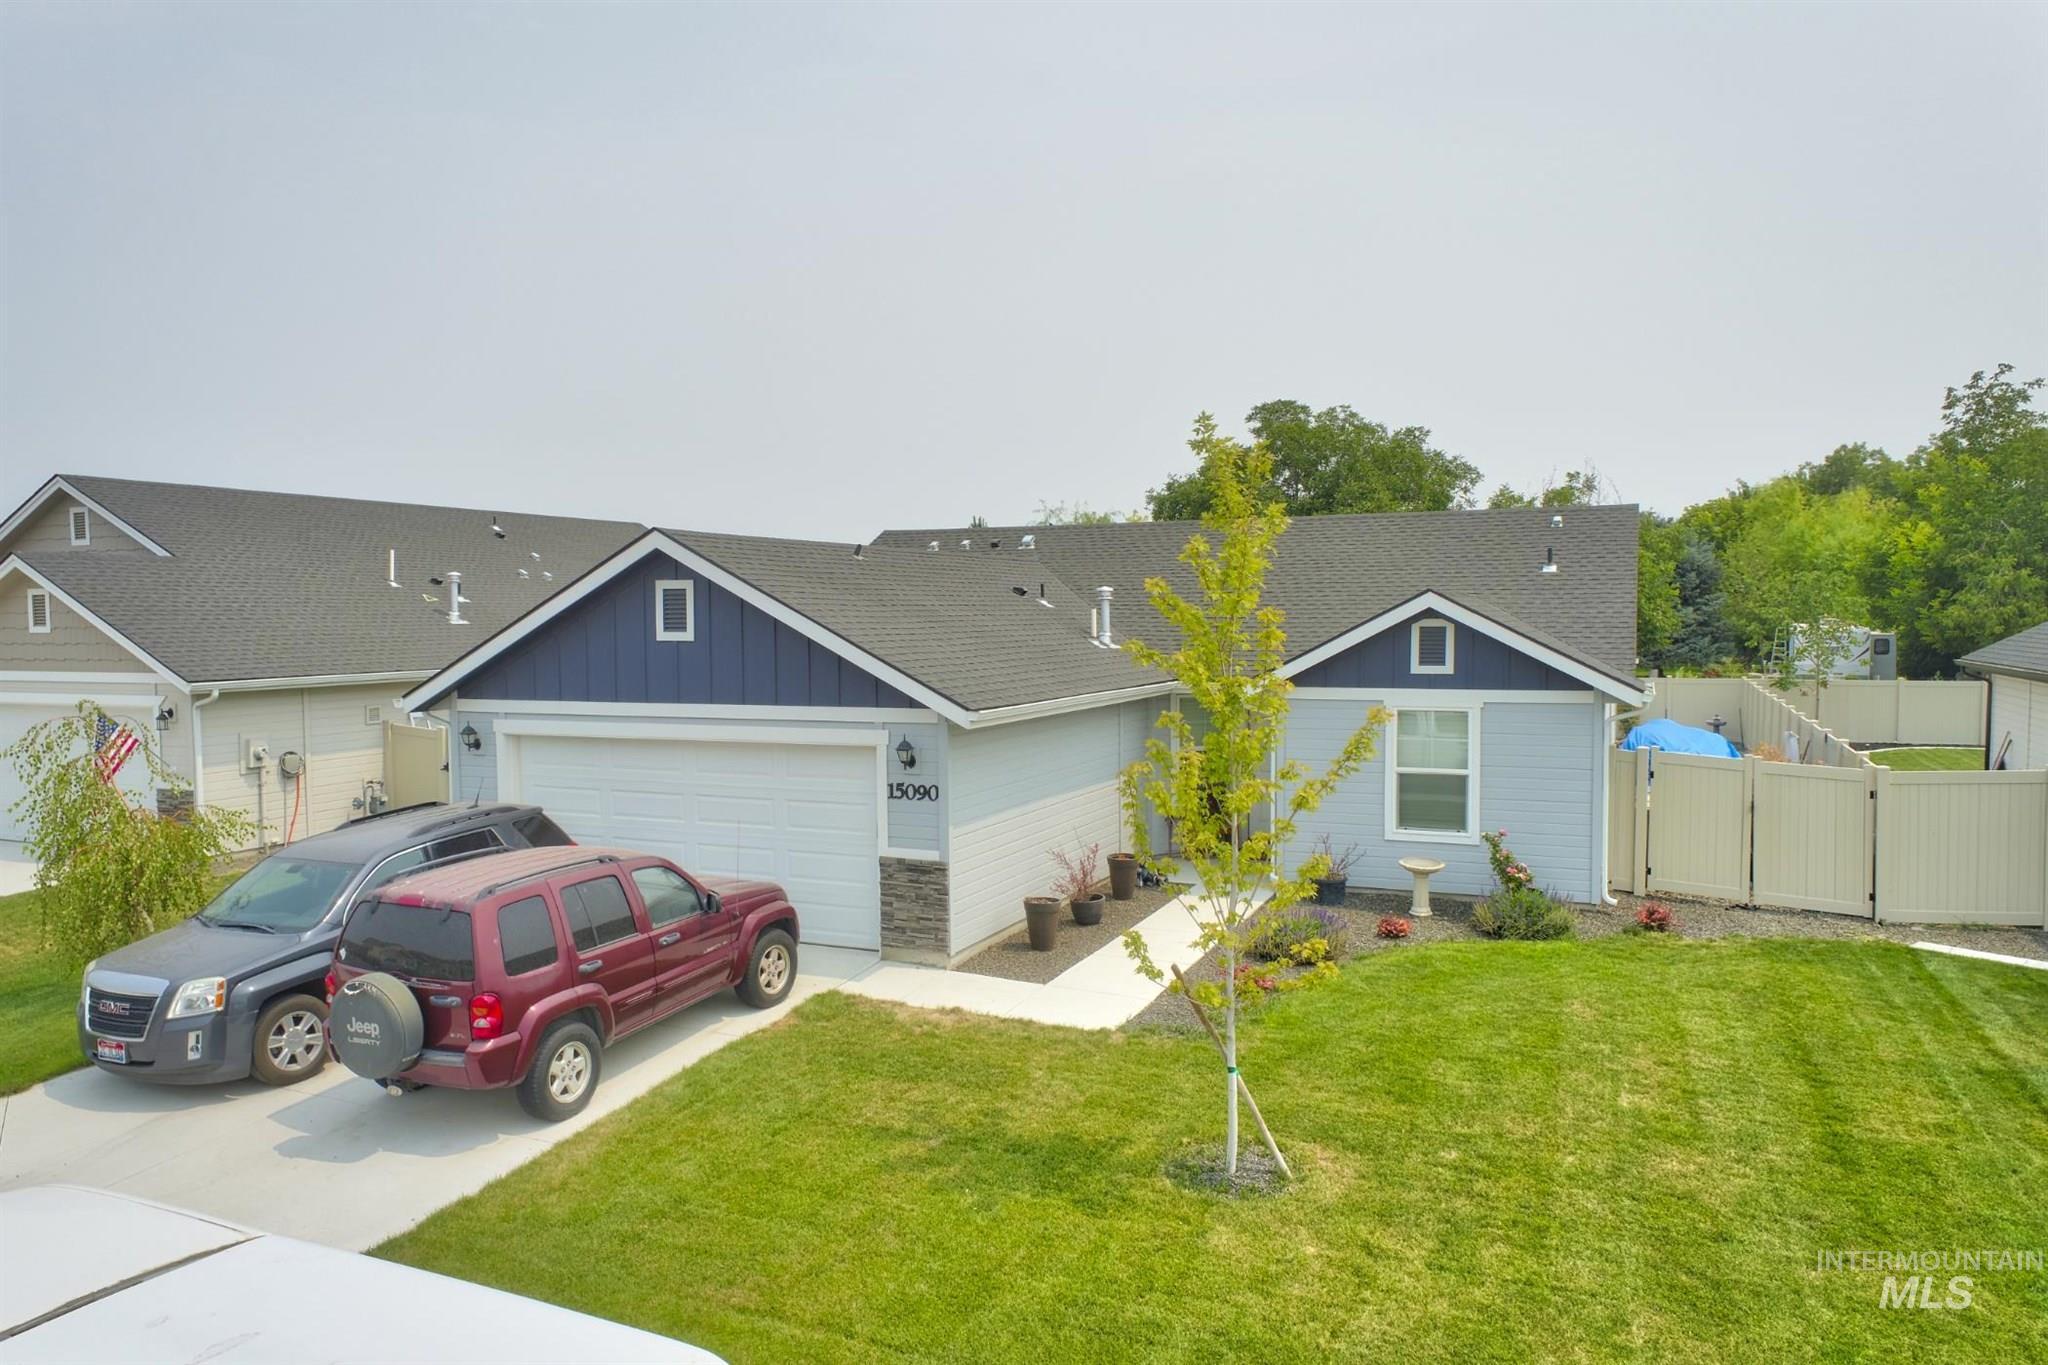 15090 N Bonelli Ave. Property Photo